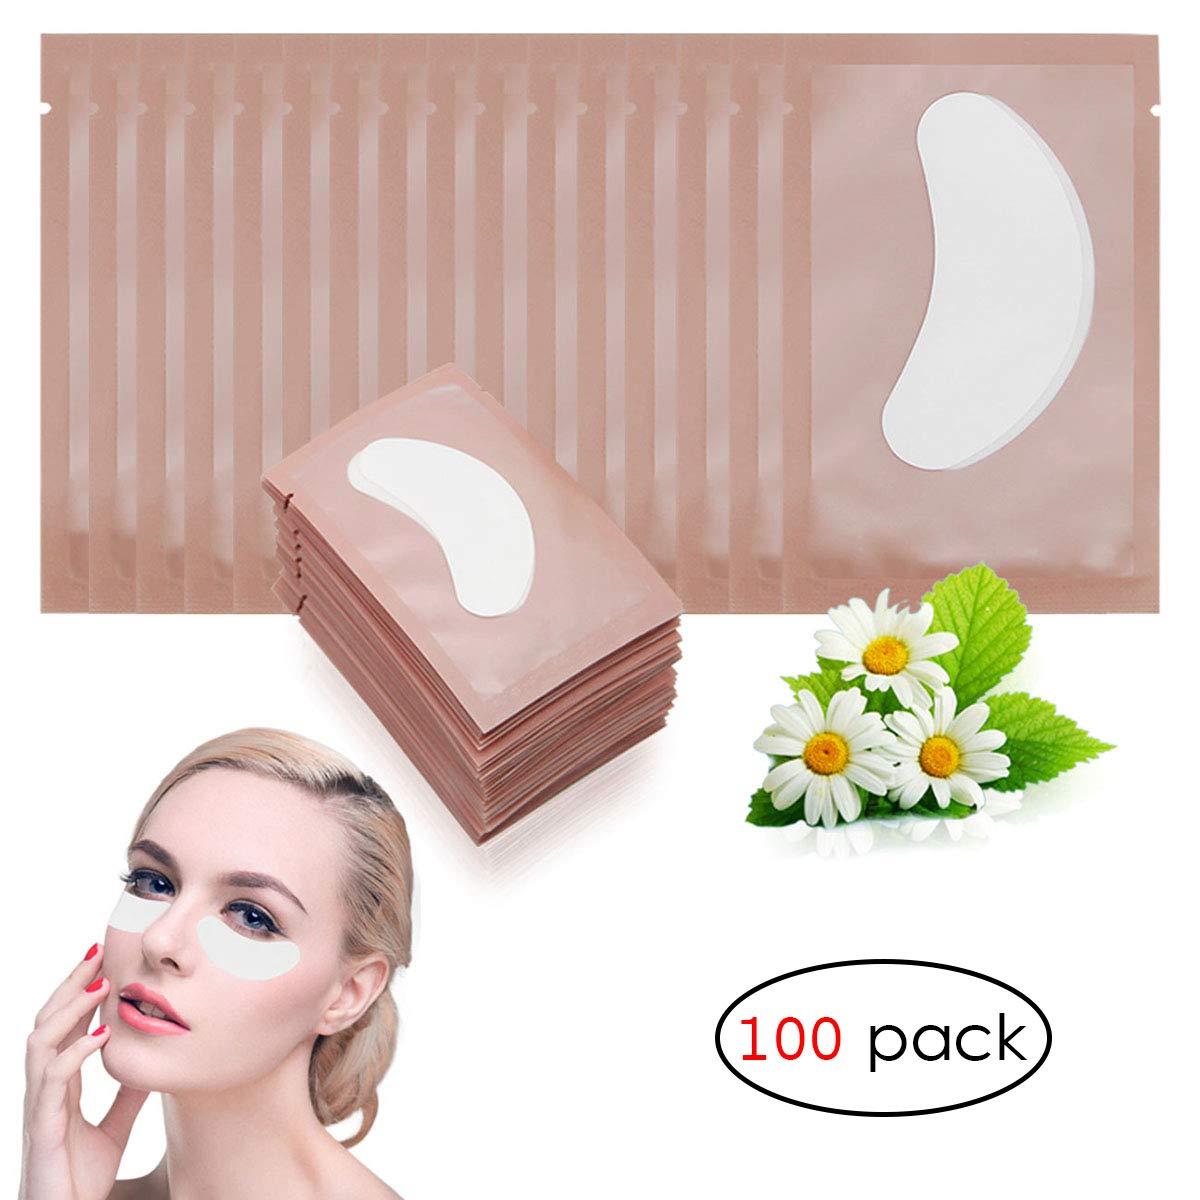 Adecco Llc 100 Pairs Under Eye Pads Lint Free Lash Extension Eye Gel Patches For Diy False Eyelash Extension Makeup Eye Mask Beauty Tool